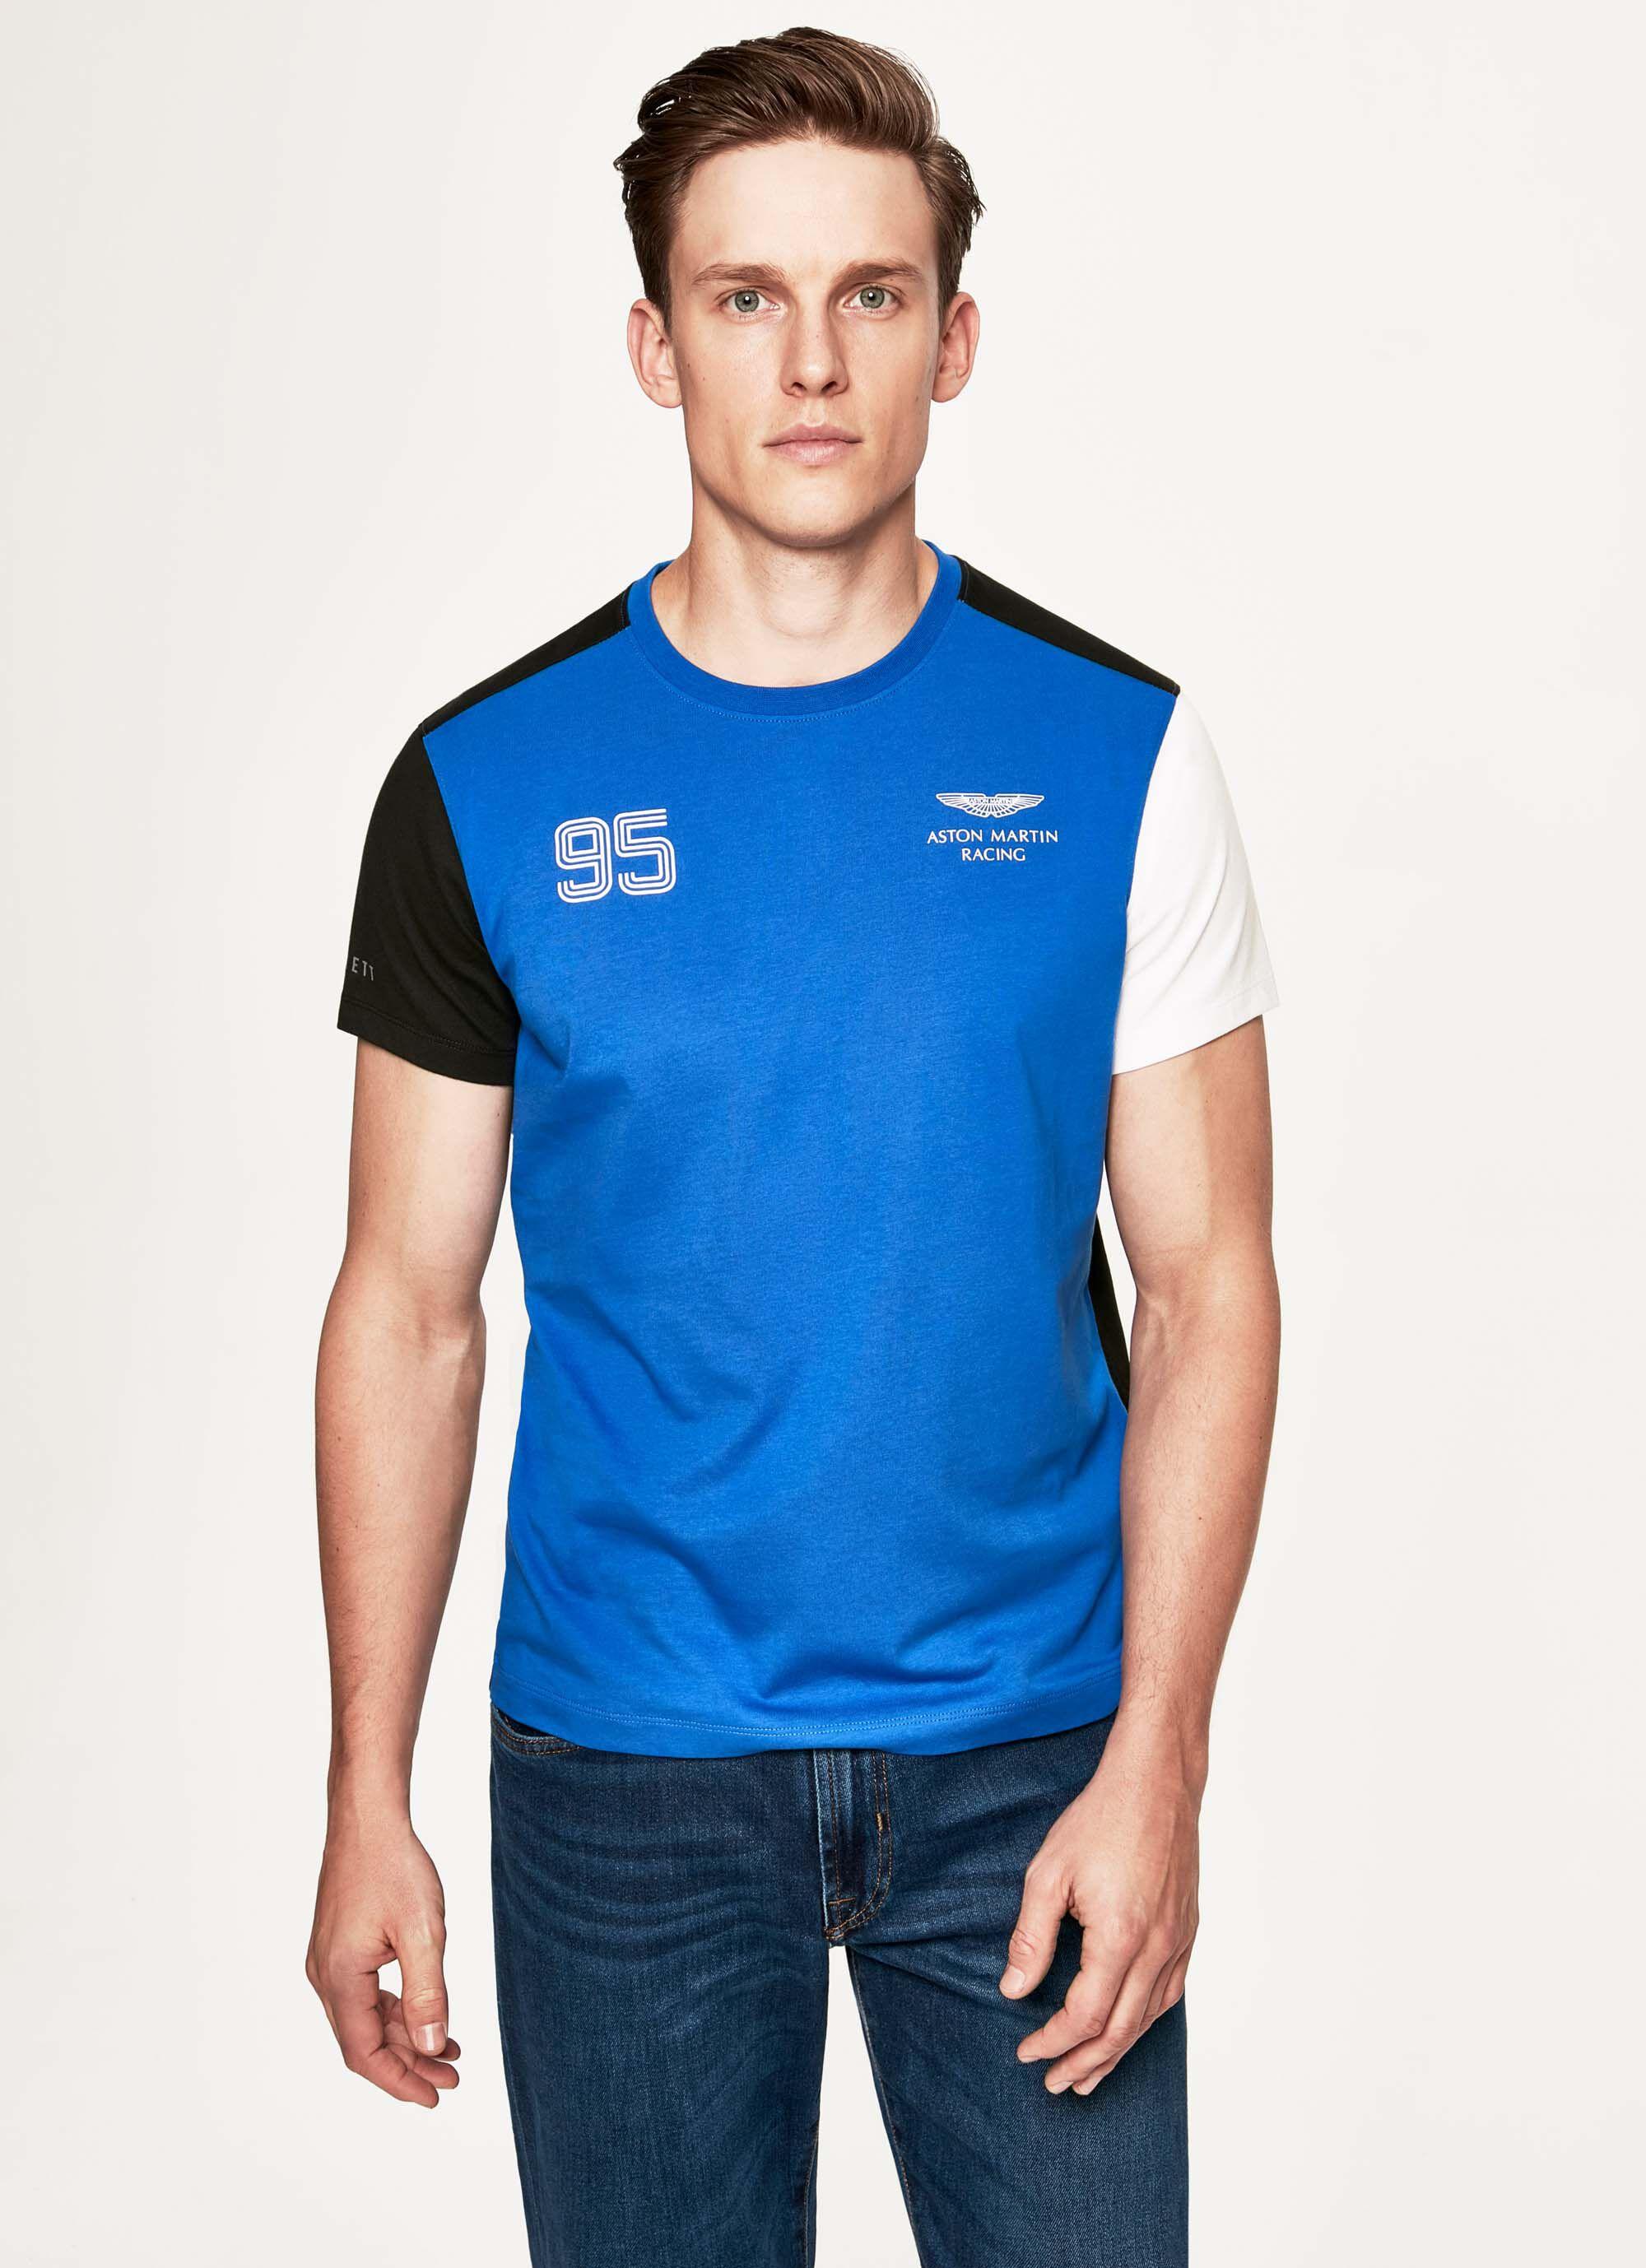 aston martin racing men's multi-coloured cotton t-shirt | large | blue